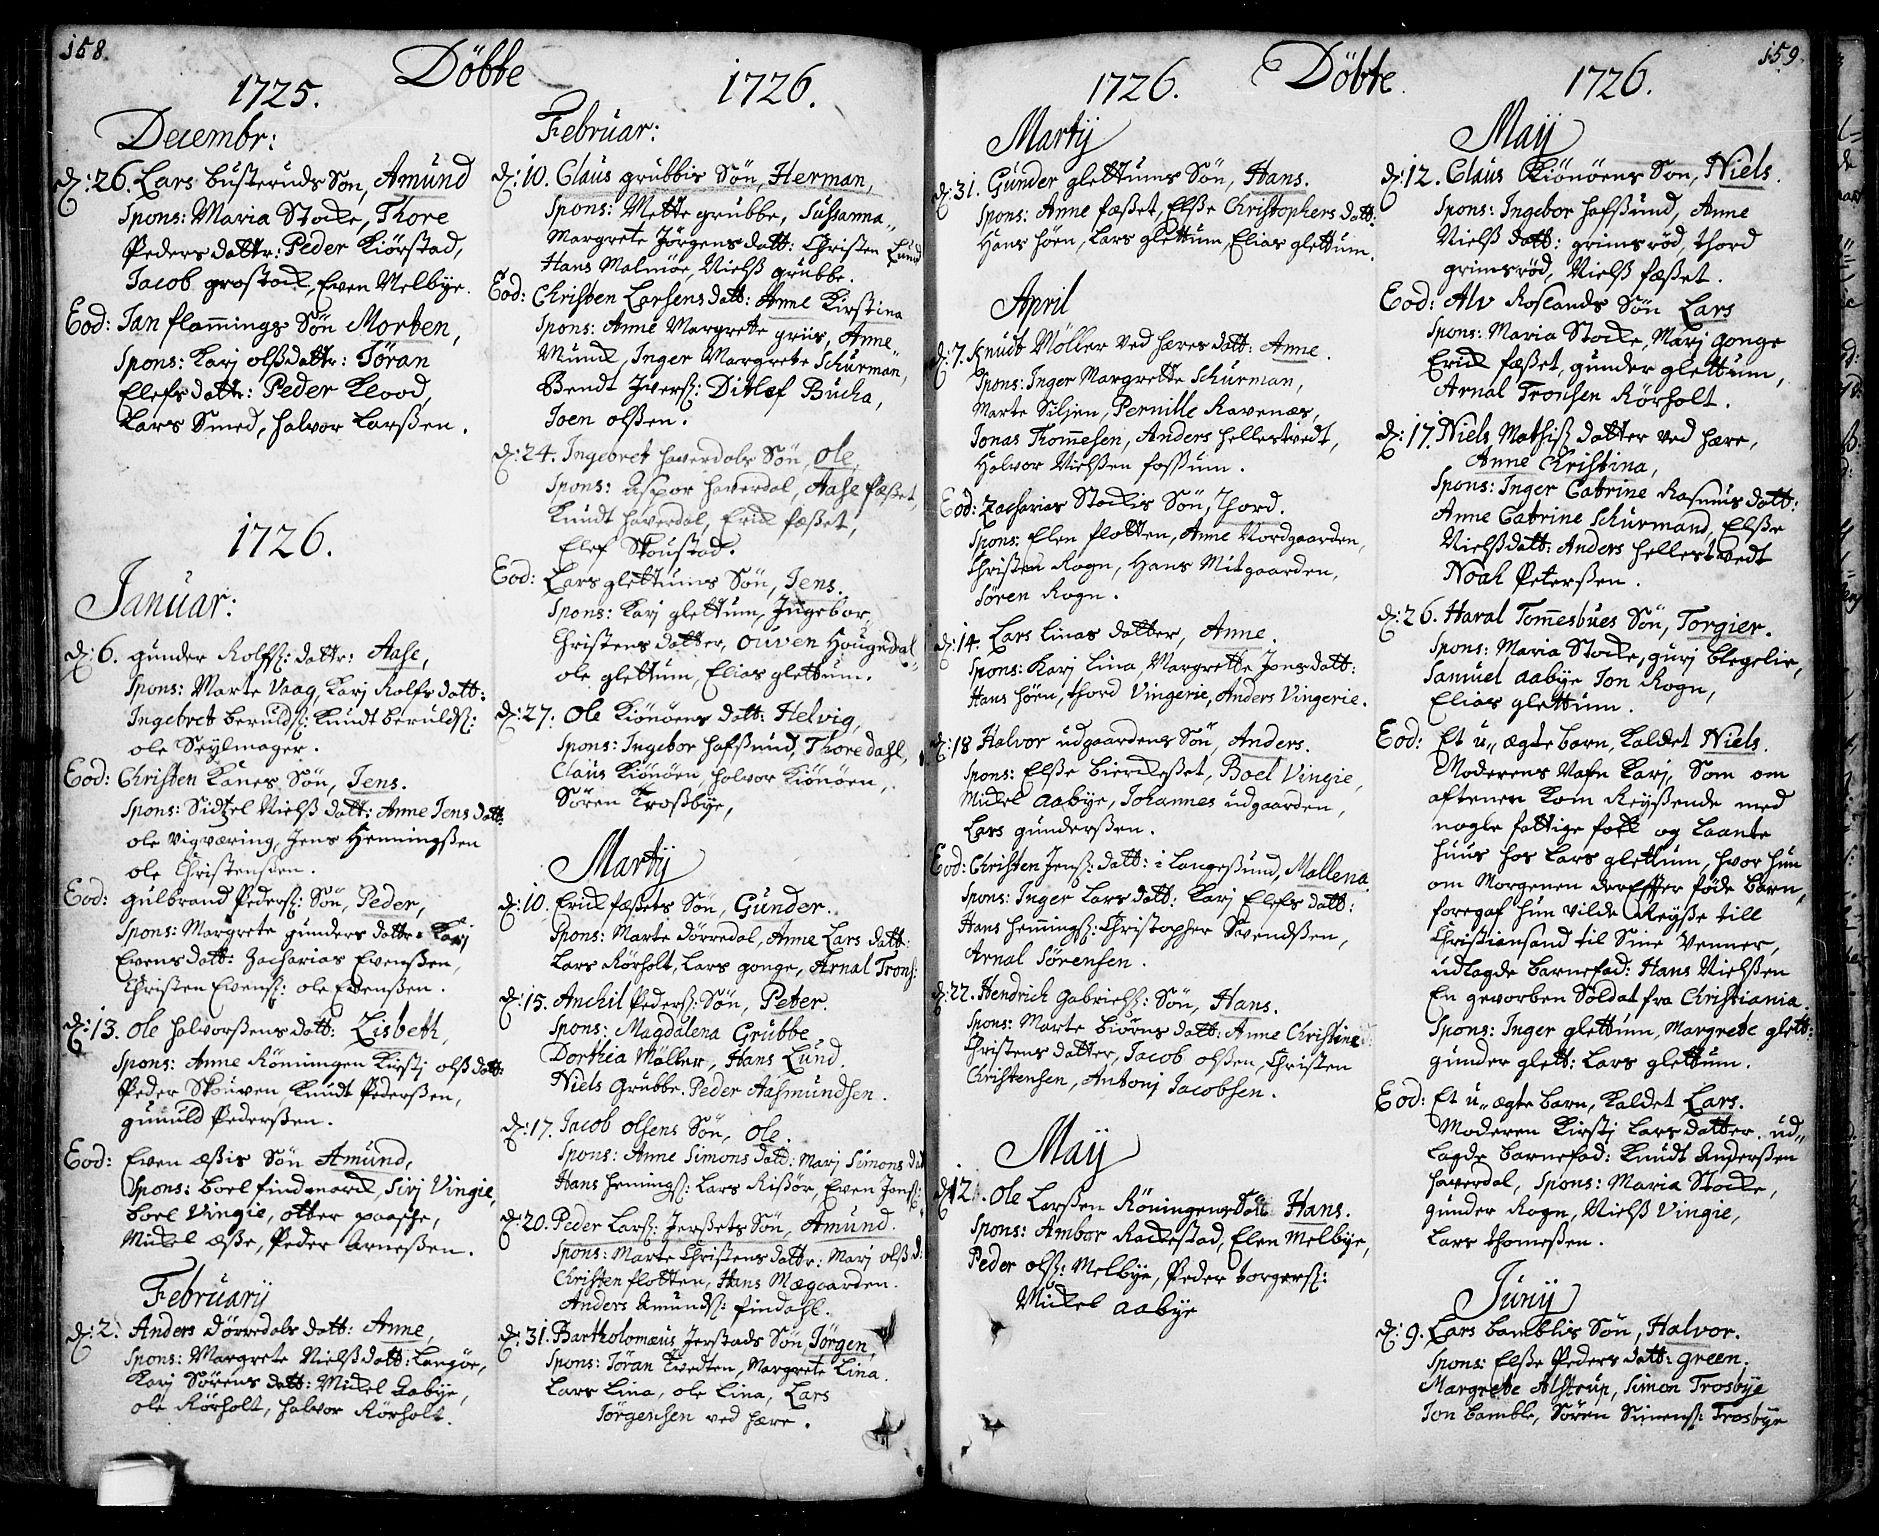 SAKO, Bamble kirkebøker, F/Fa/L0001: Ministerialbok nr. I 1, 1702-1774, s. 158-159